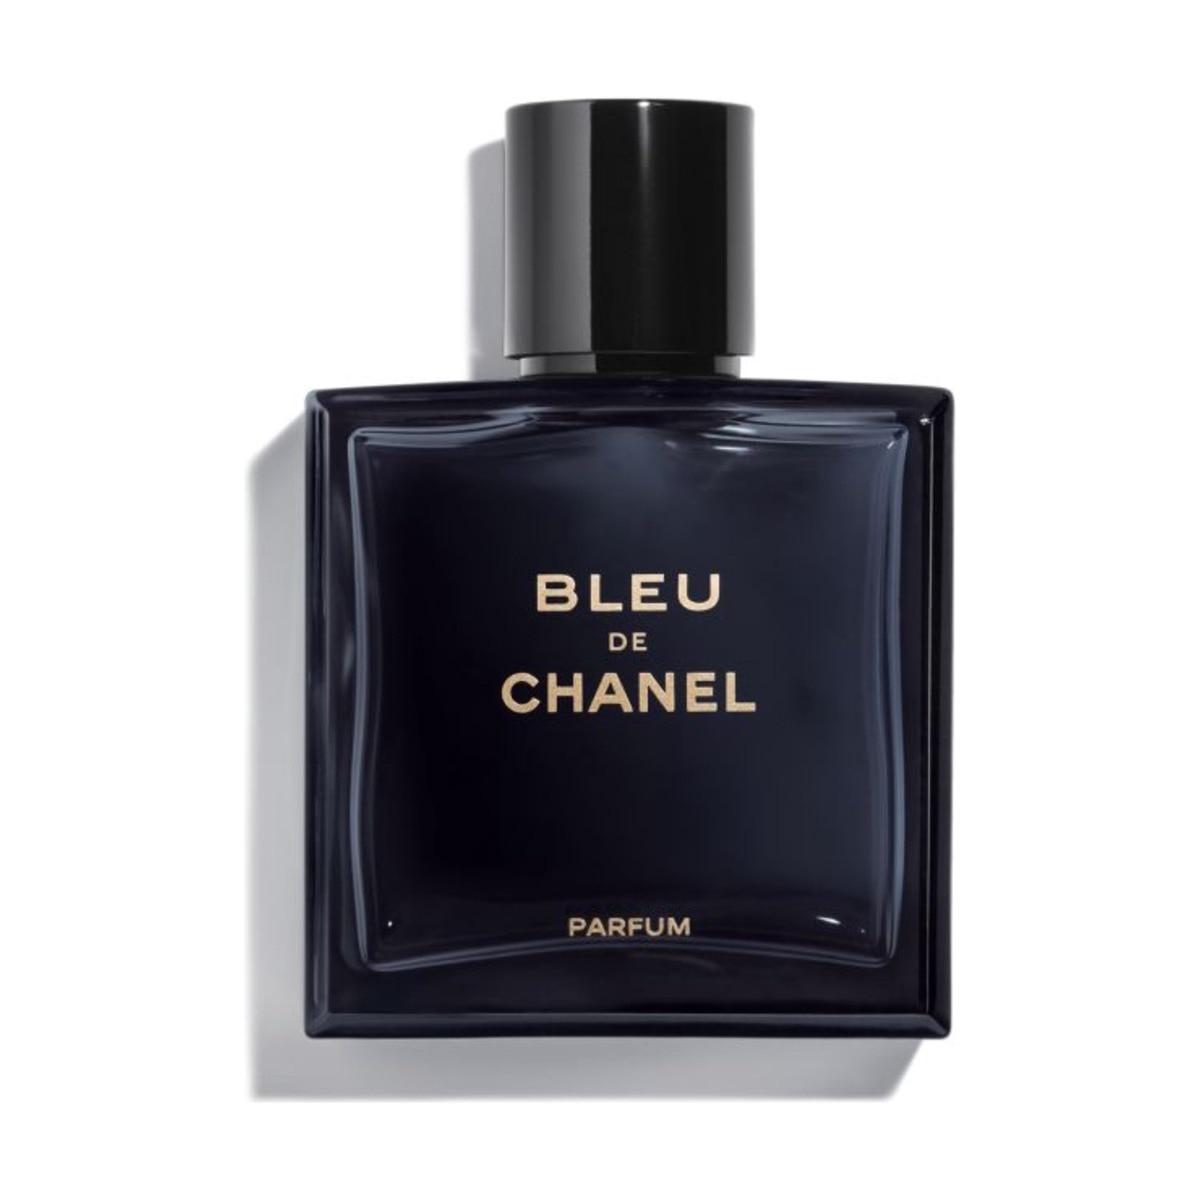 Parfum Chanel Bleu de Chanel - 50ml